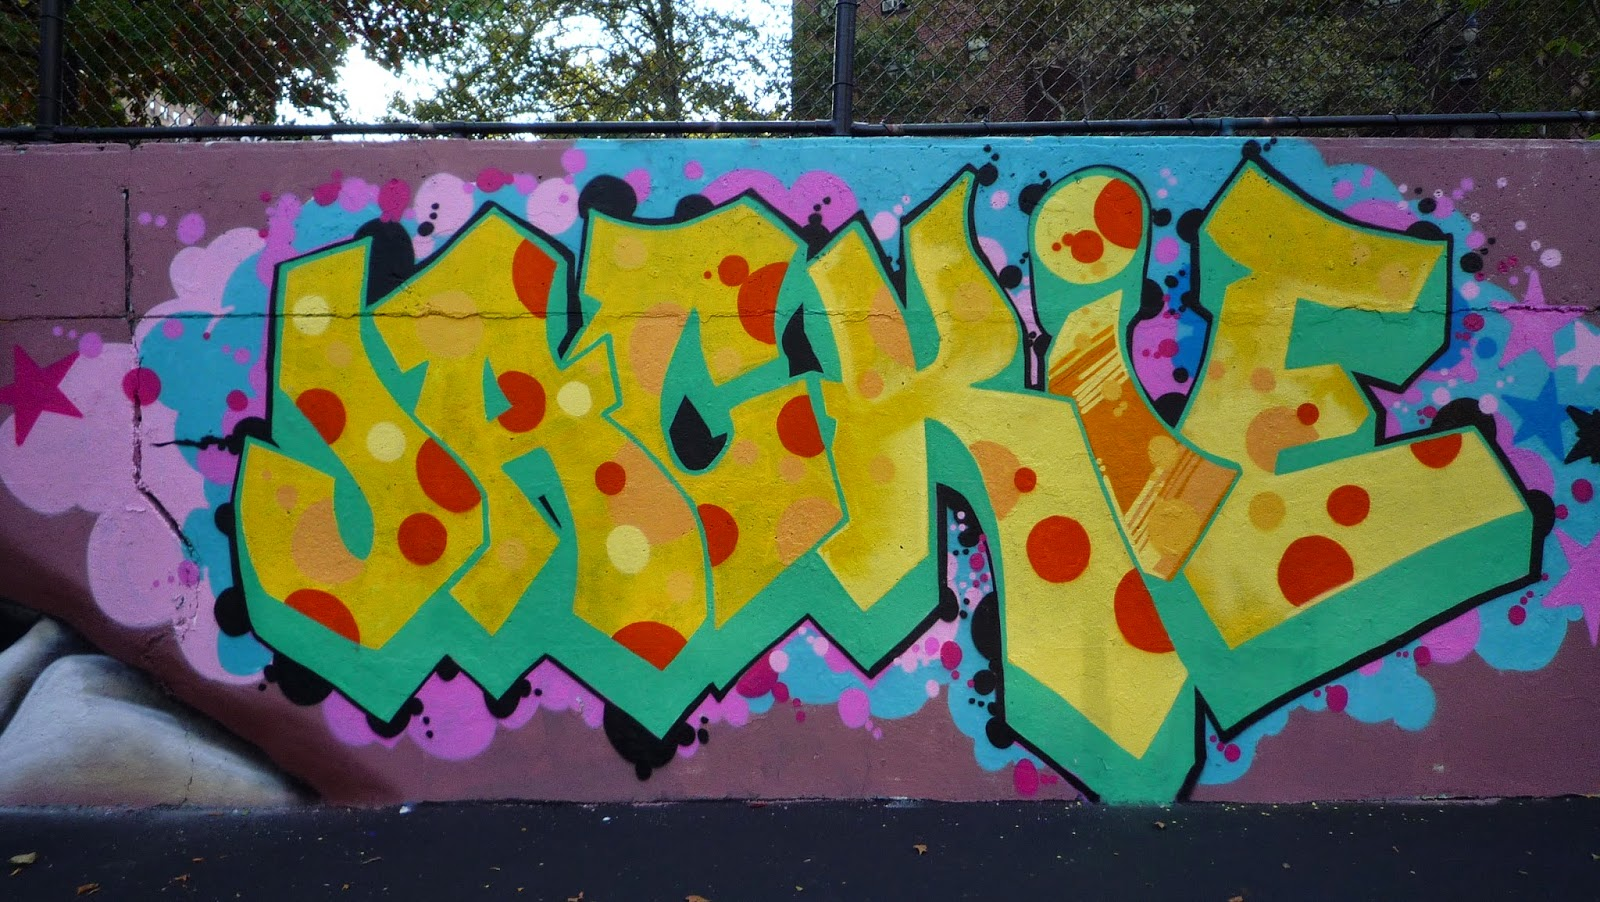 graffiti wall of fame New York (2008) | urban art views